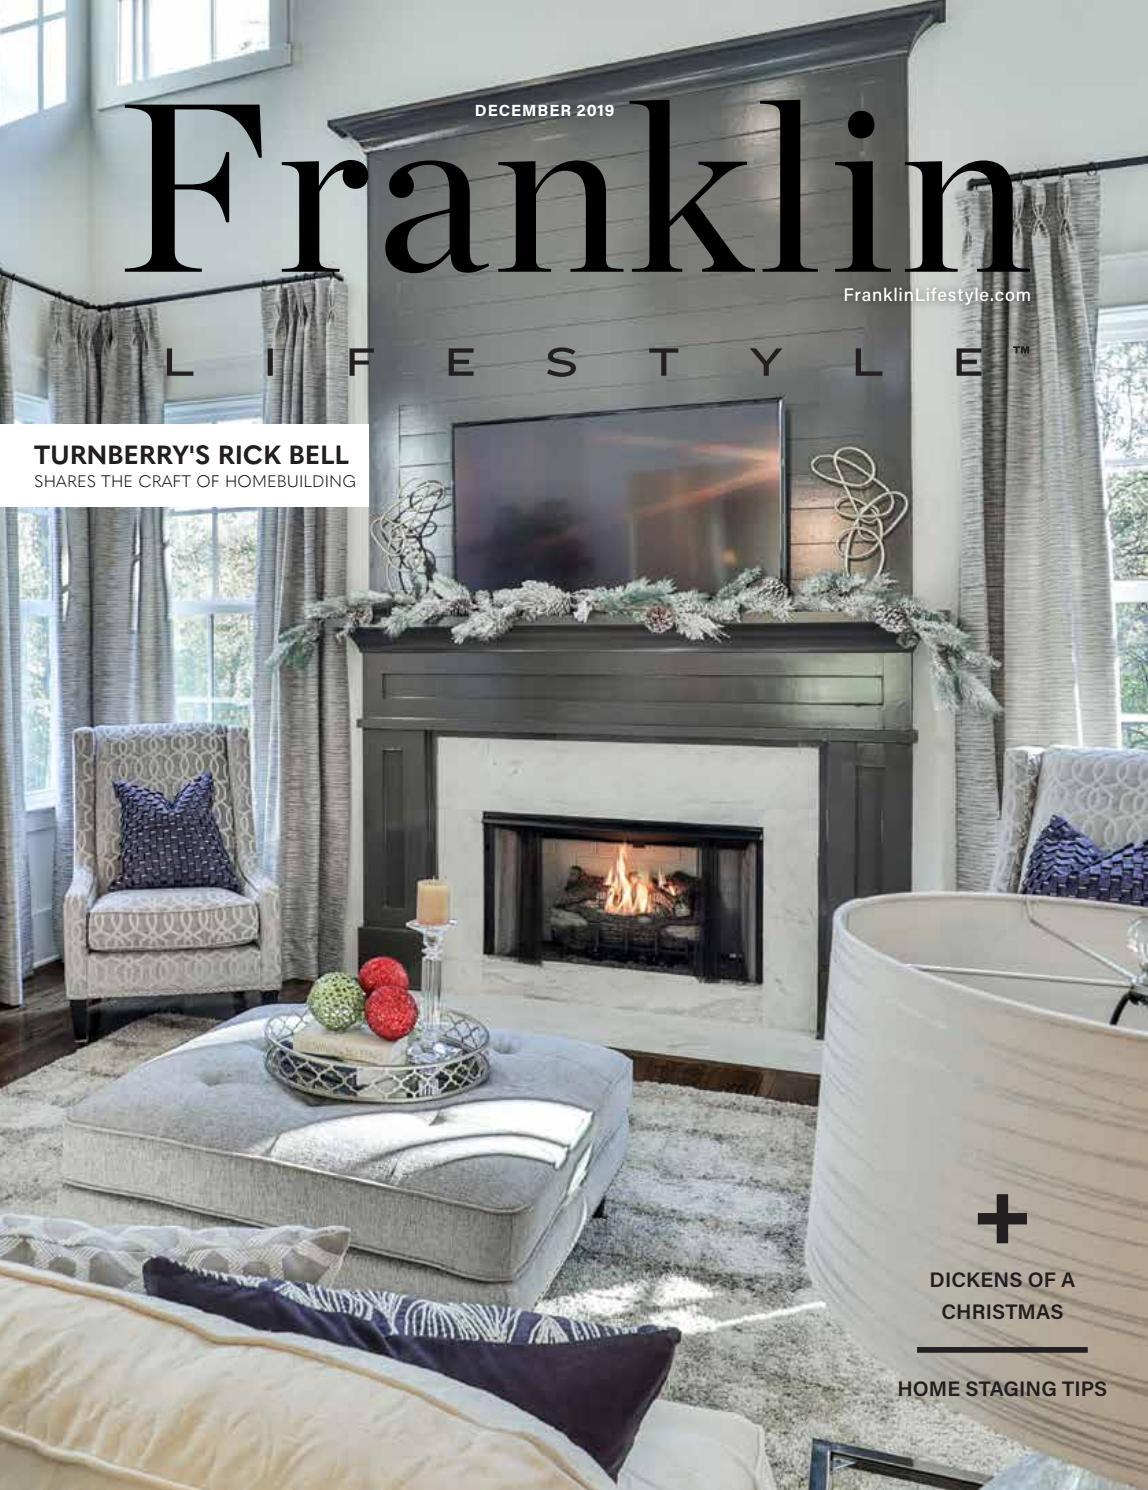 Franklin Tn December 2019 By Lifestyle